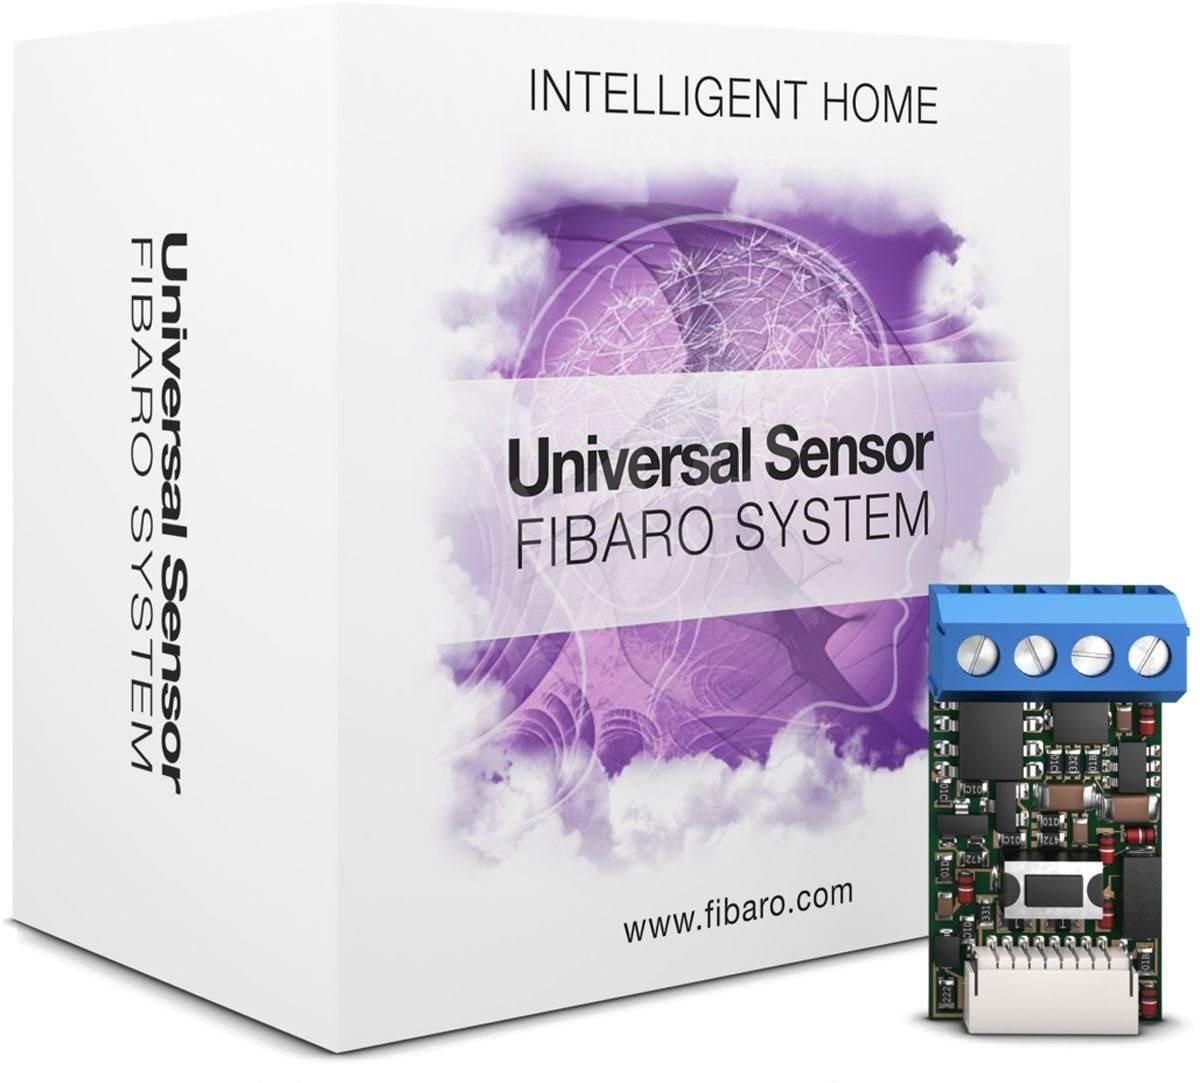 Fibaro BINARY SENSOR UNIVERSAL FGBS-001, Black устройство умного дома